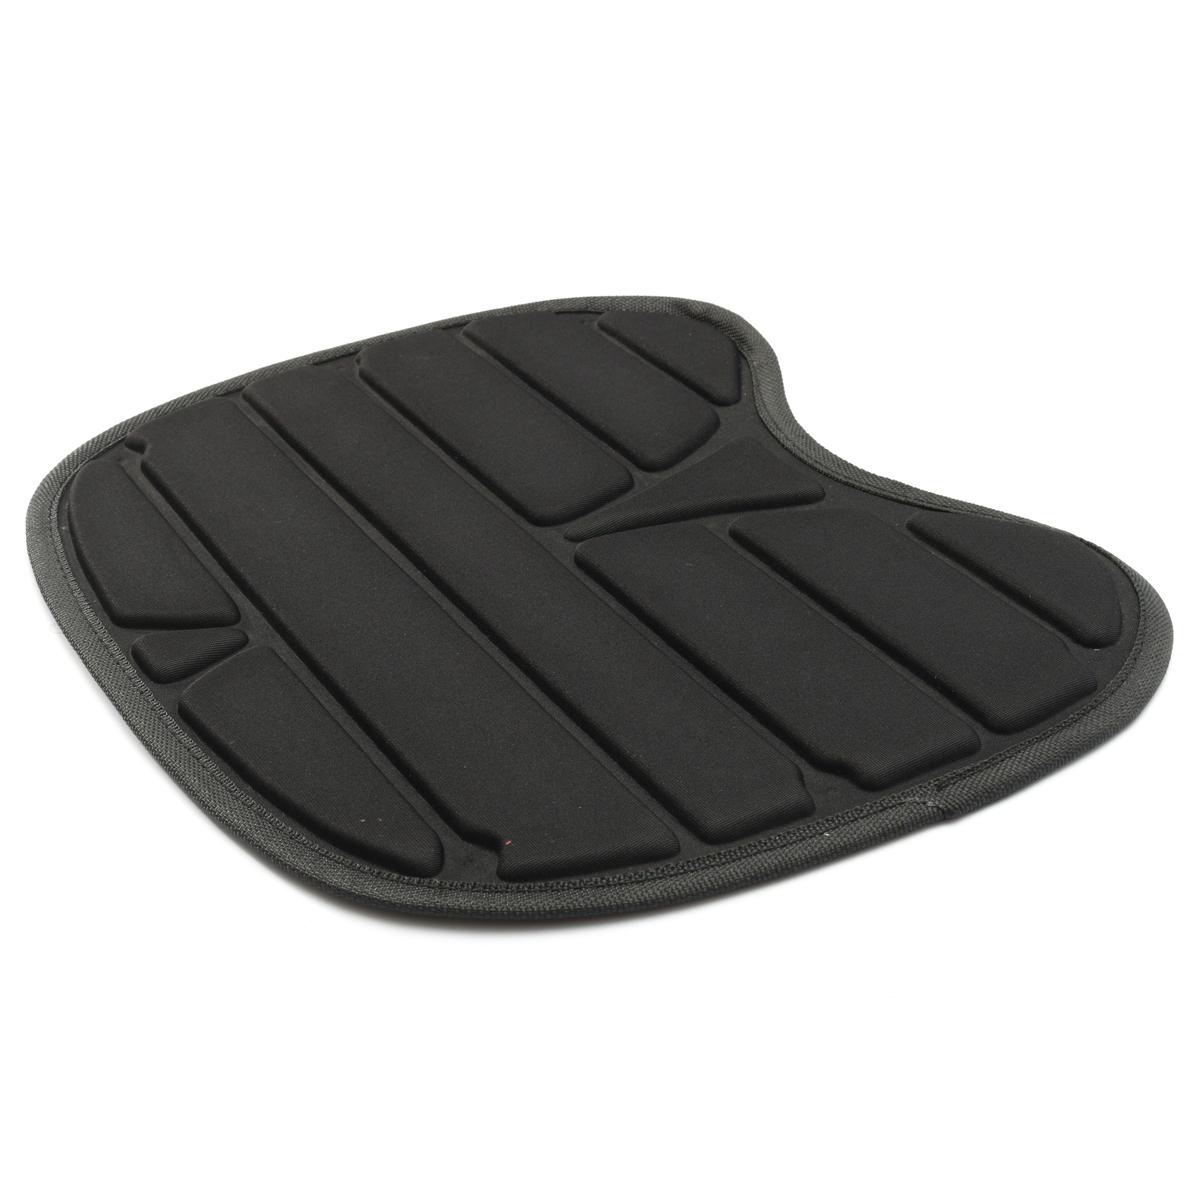 1x kayak canoe dinghy boat EVA padded seat cushion black soft comfFJ